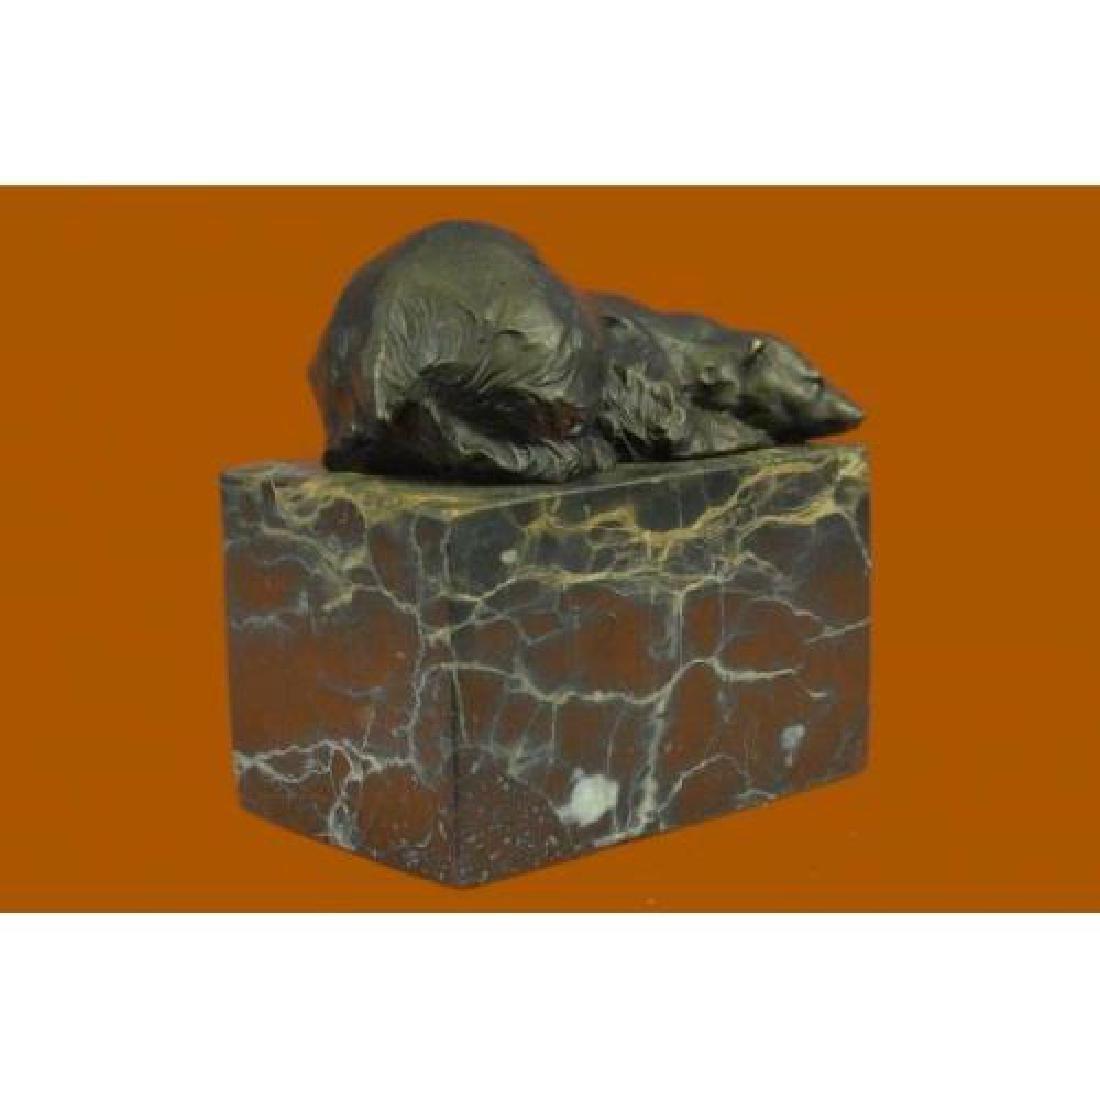 Polar Bear Bronze Sculpture on Marble Base Sculpture - 4